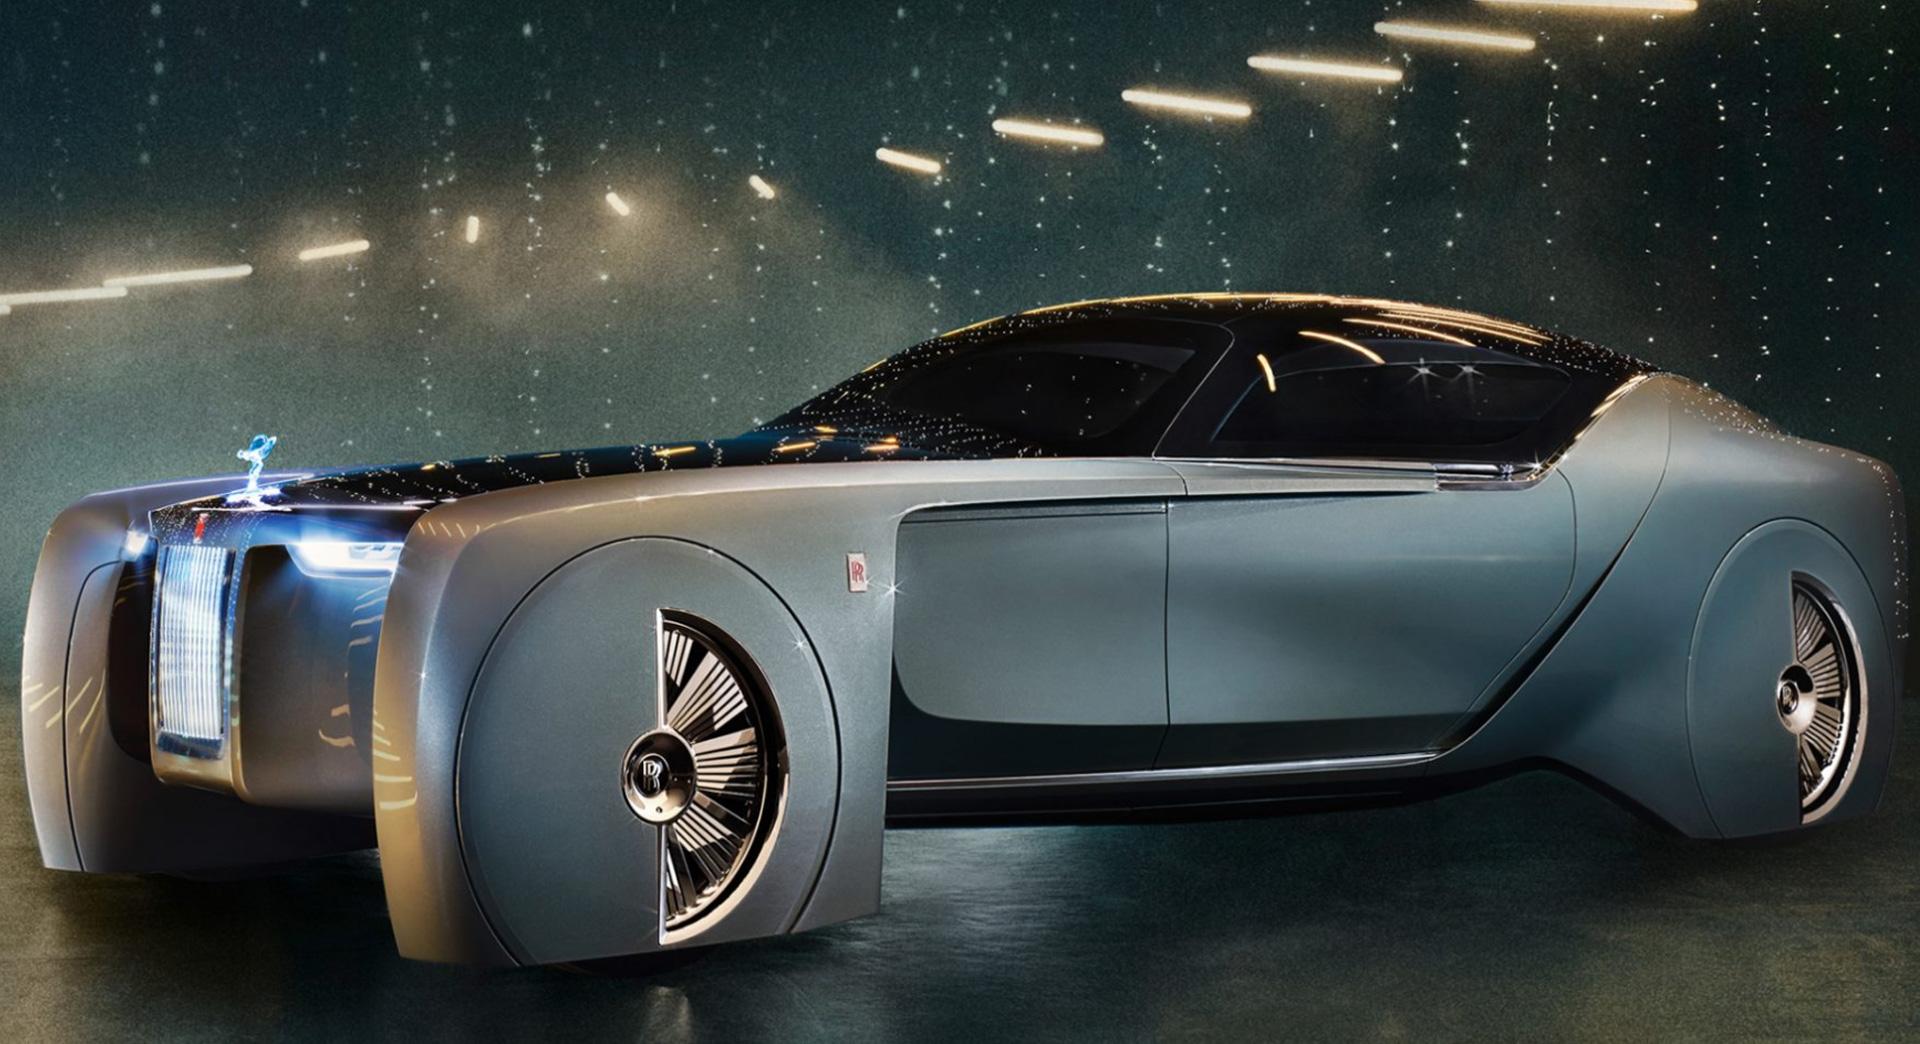 la voiture du futur imagin e par rolls royce est juste splendide tech numerama. Black Bedroom Furniture Sets. Home Design Ideas